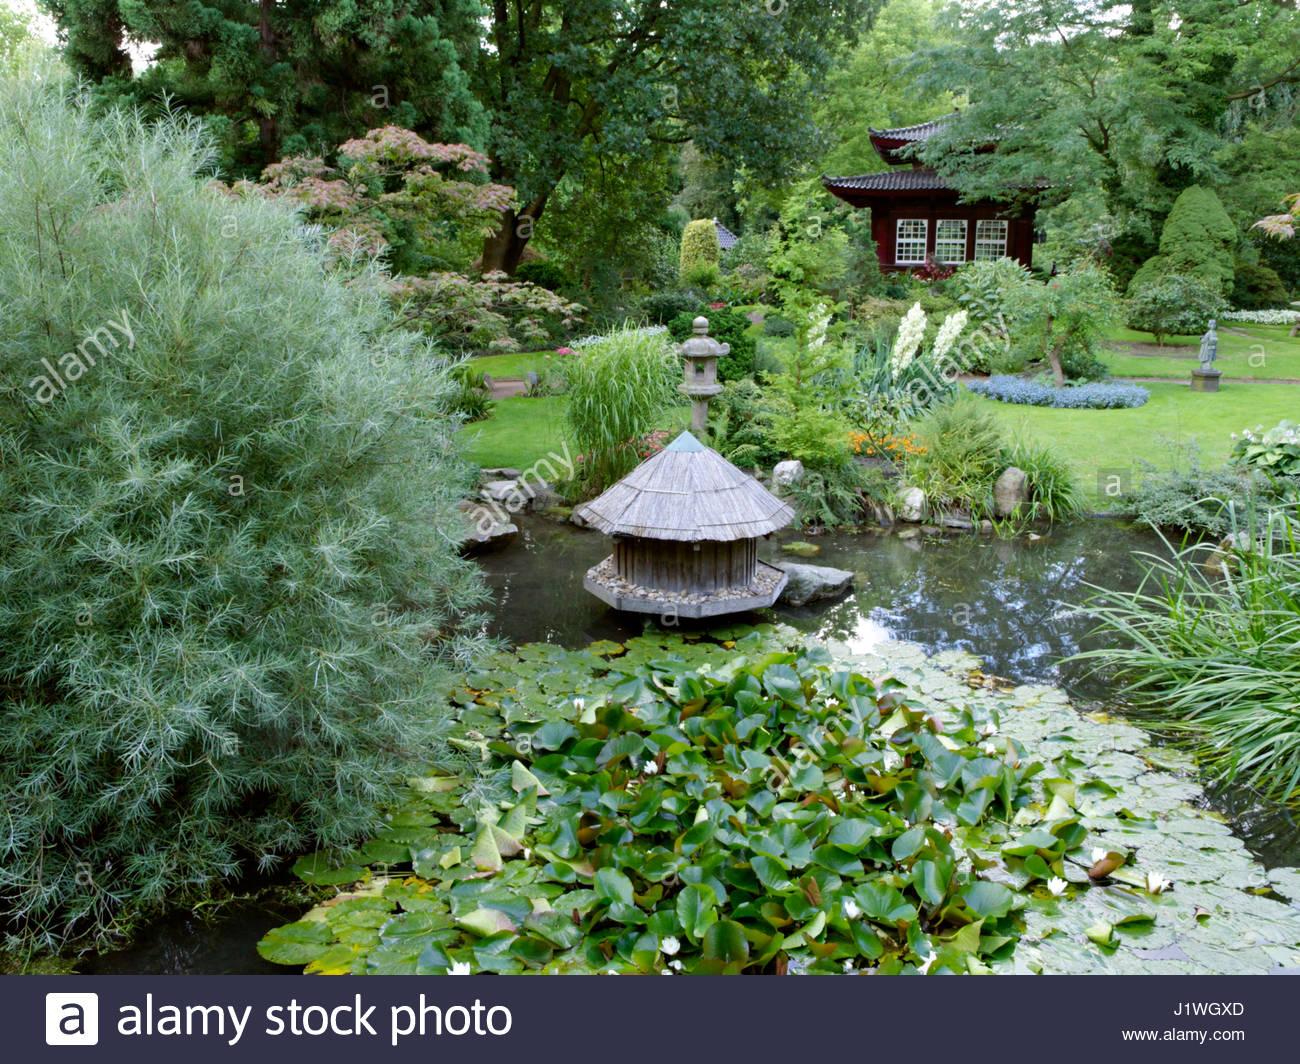 japanese garden leverkusen germany stockfotos japanese garden leverkusen germany bilder alamy. Black Bedroom Furniture Sets. Home Design Ideas